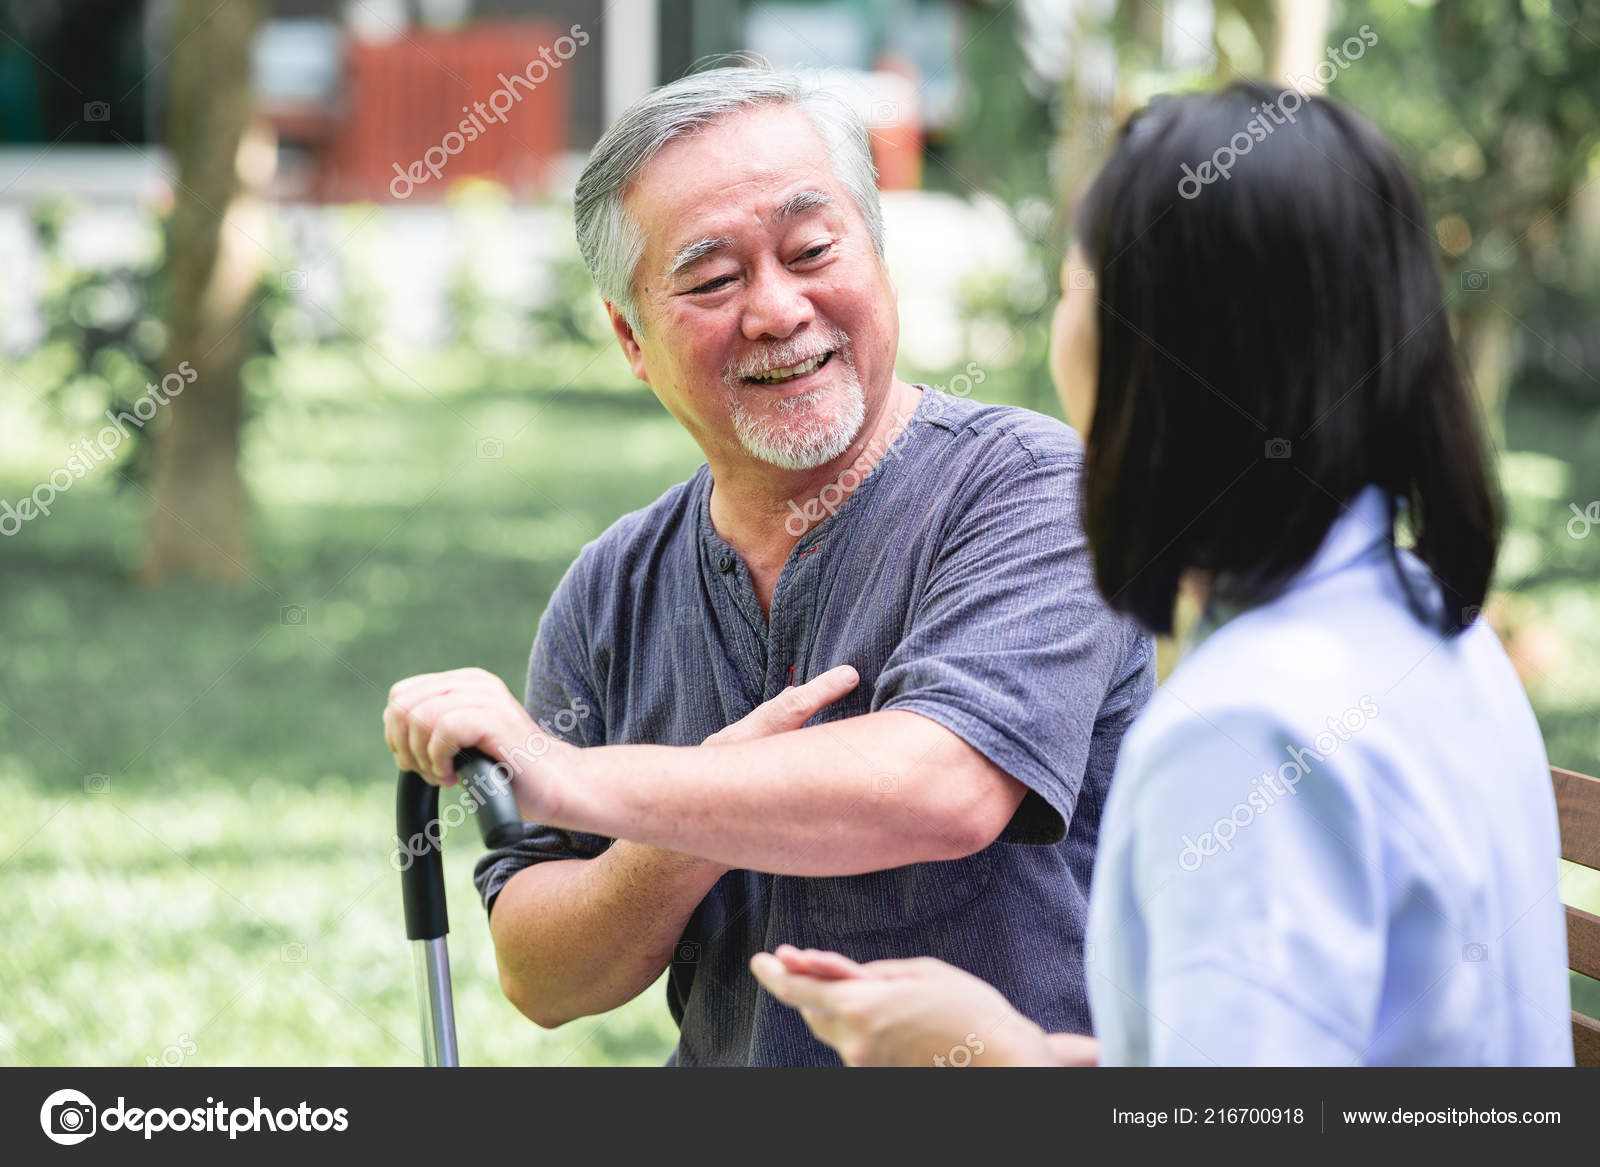 Nurse Patient Sitting Bench Together Talking Asian Old Man